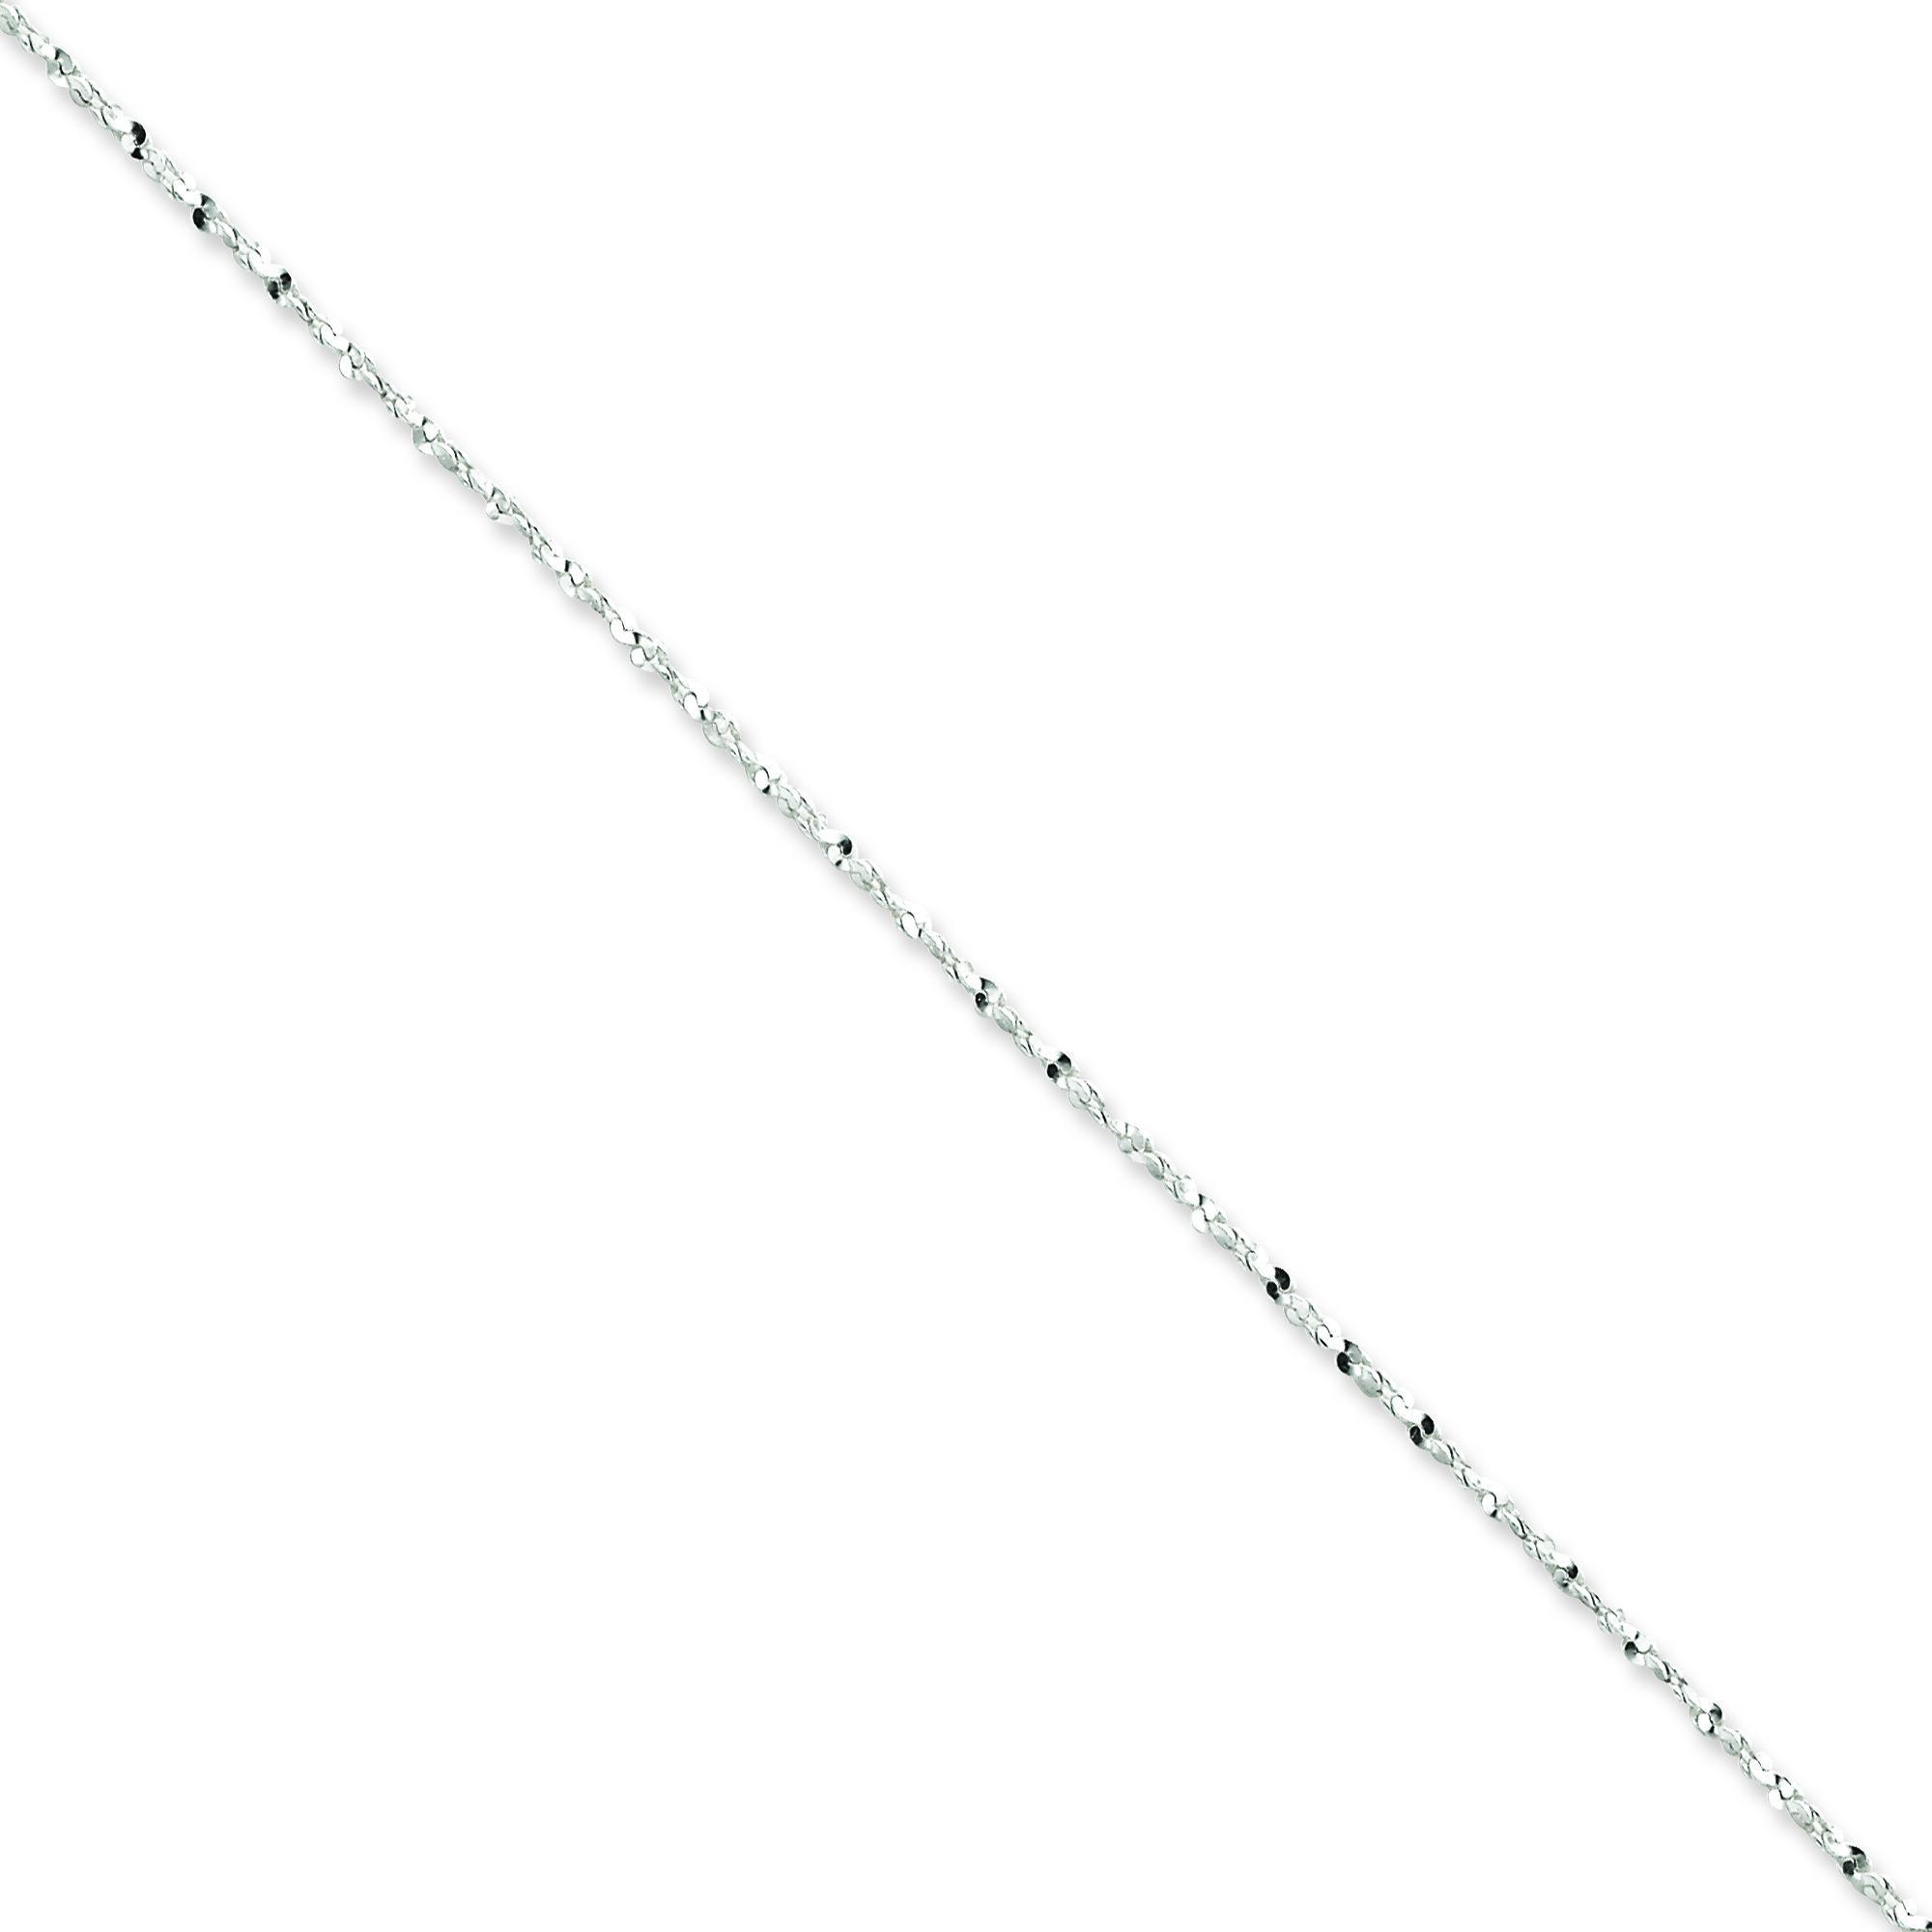 Sterling Silver 16 inch 1.40 mm Twisted Serpentine Fancy Choker Necklace